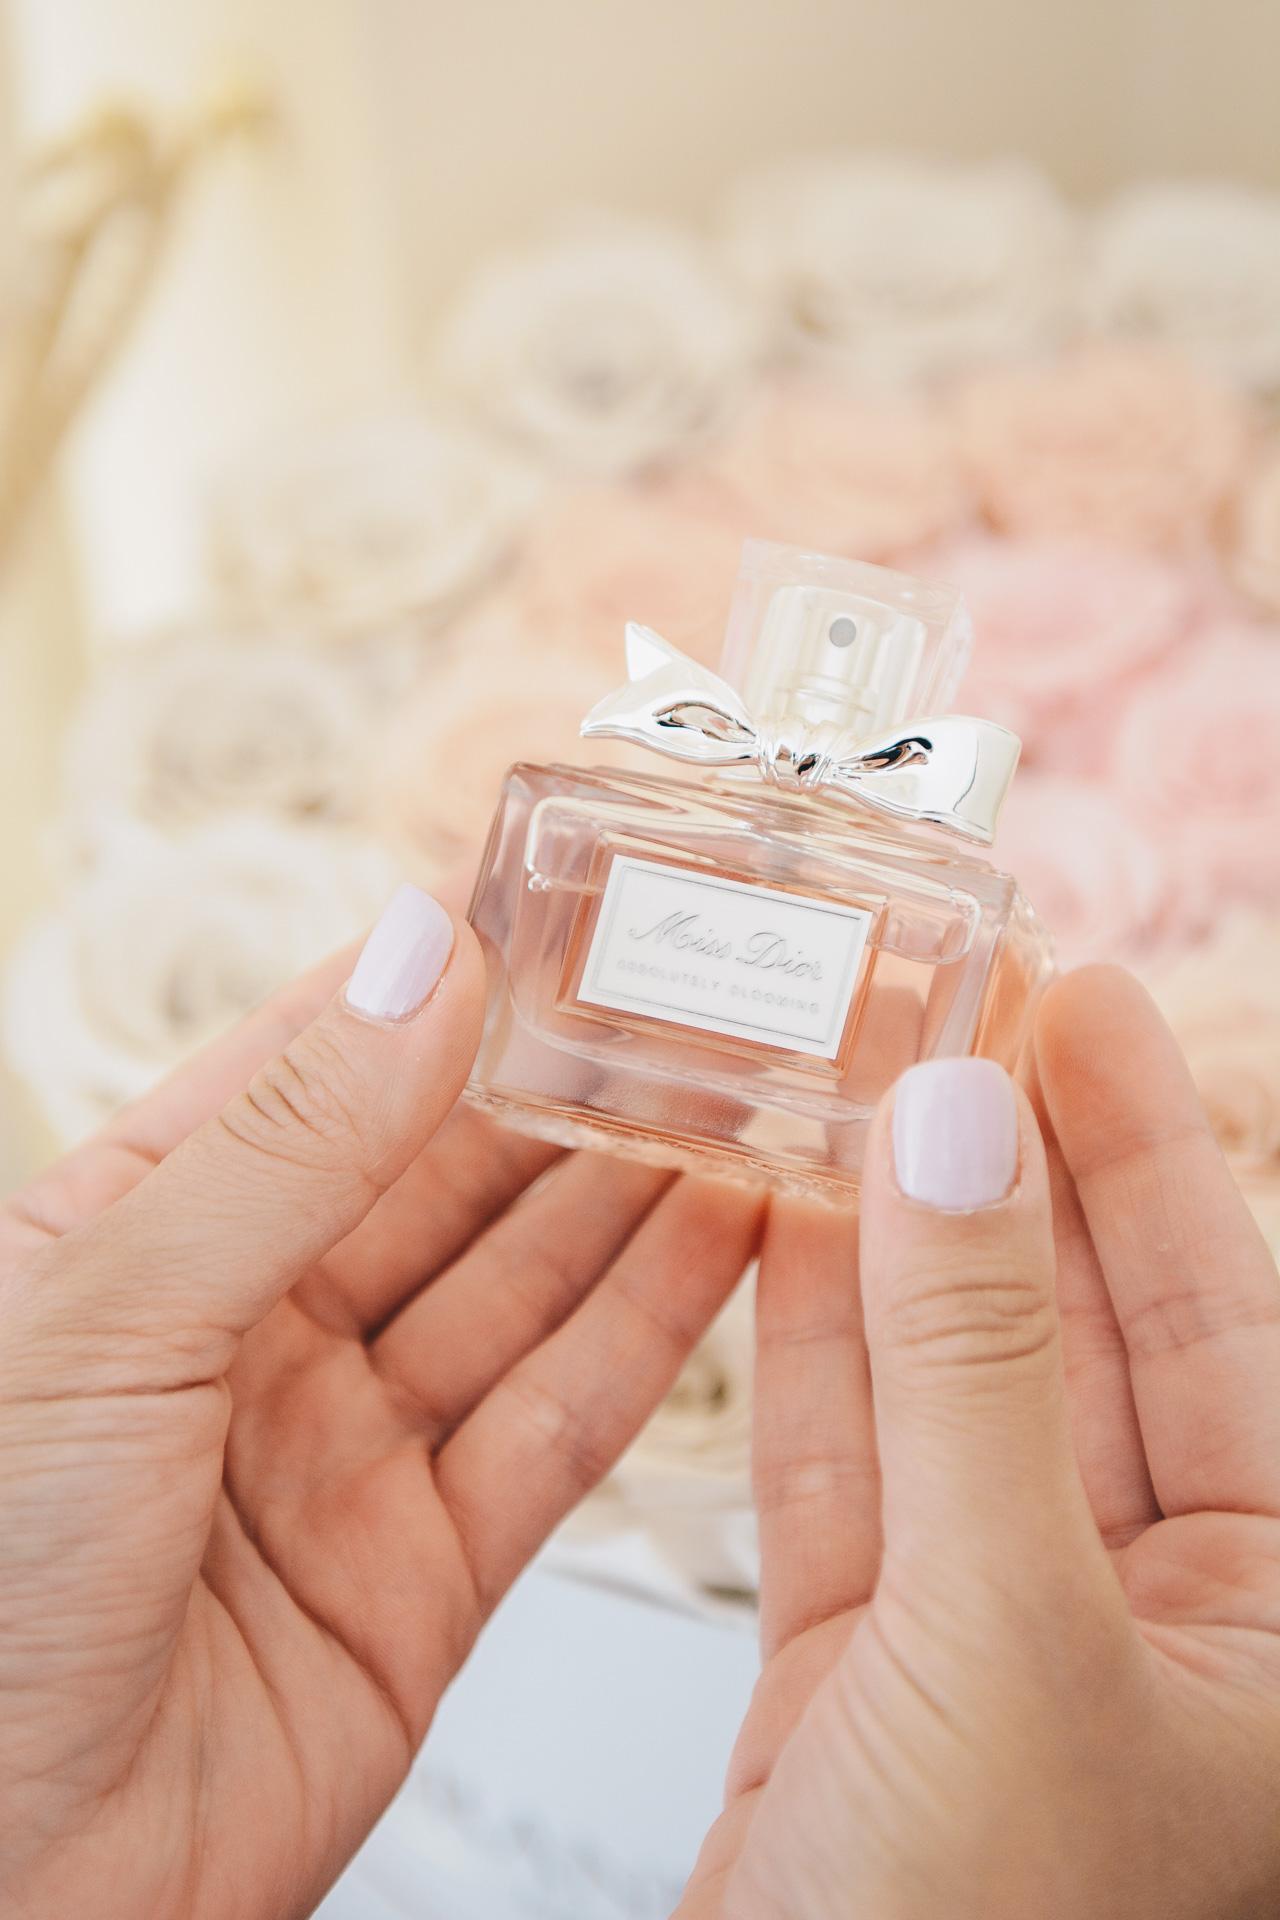 Miss Dior Bloom Fragrance Perfume